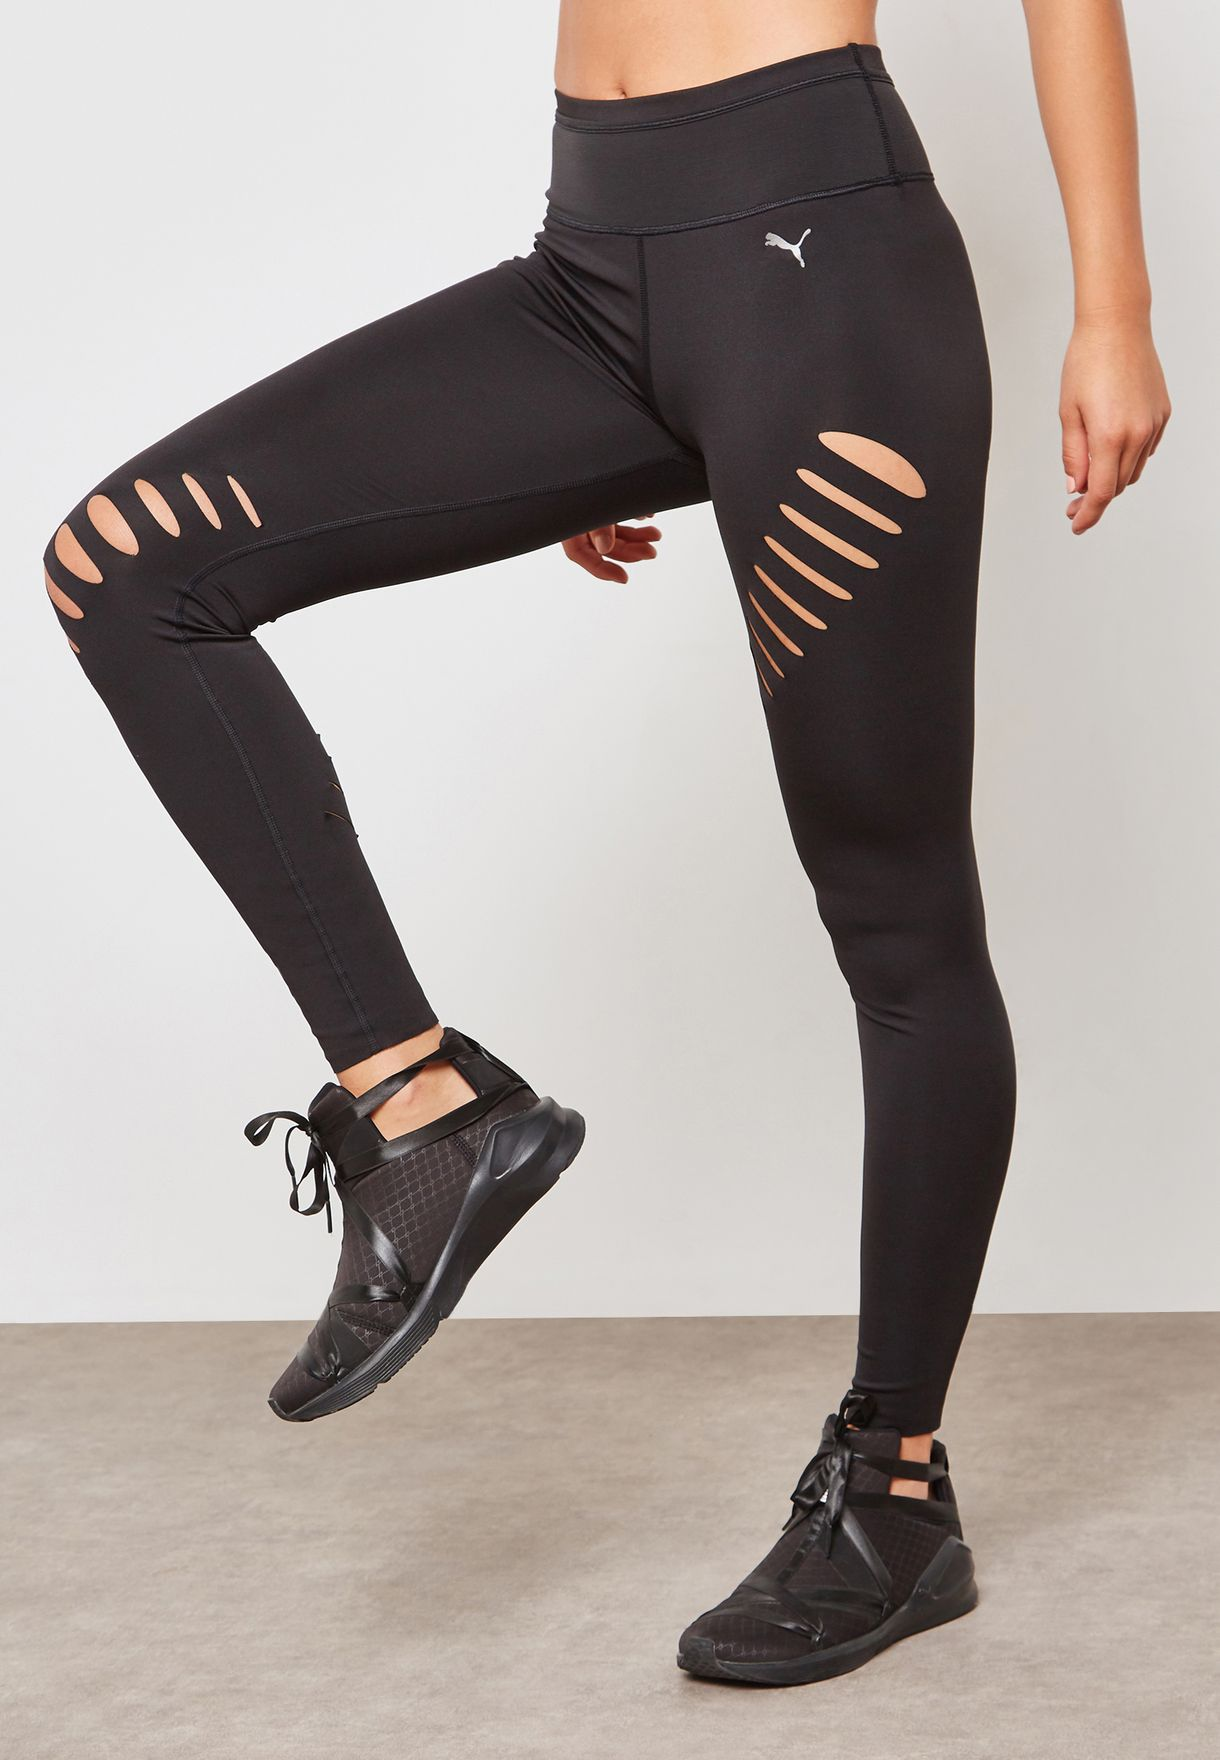 57b47a2c4 Shop PUMA black Explosive Slash Leggings 51673101 for Women in UAE ...